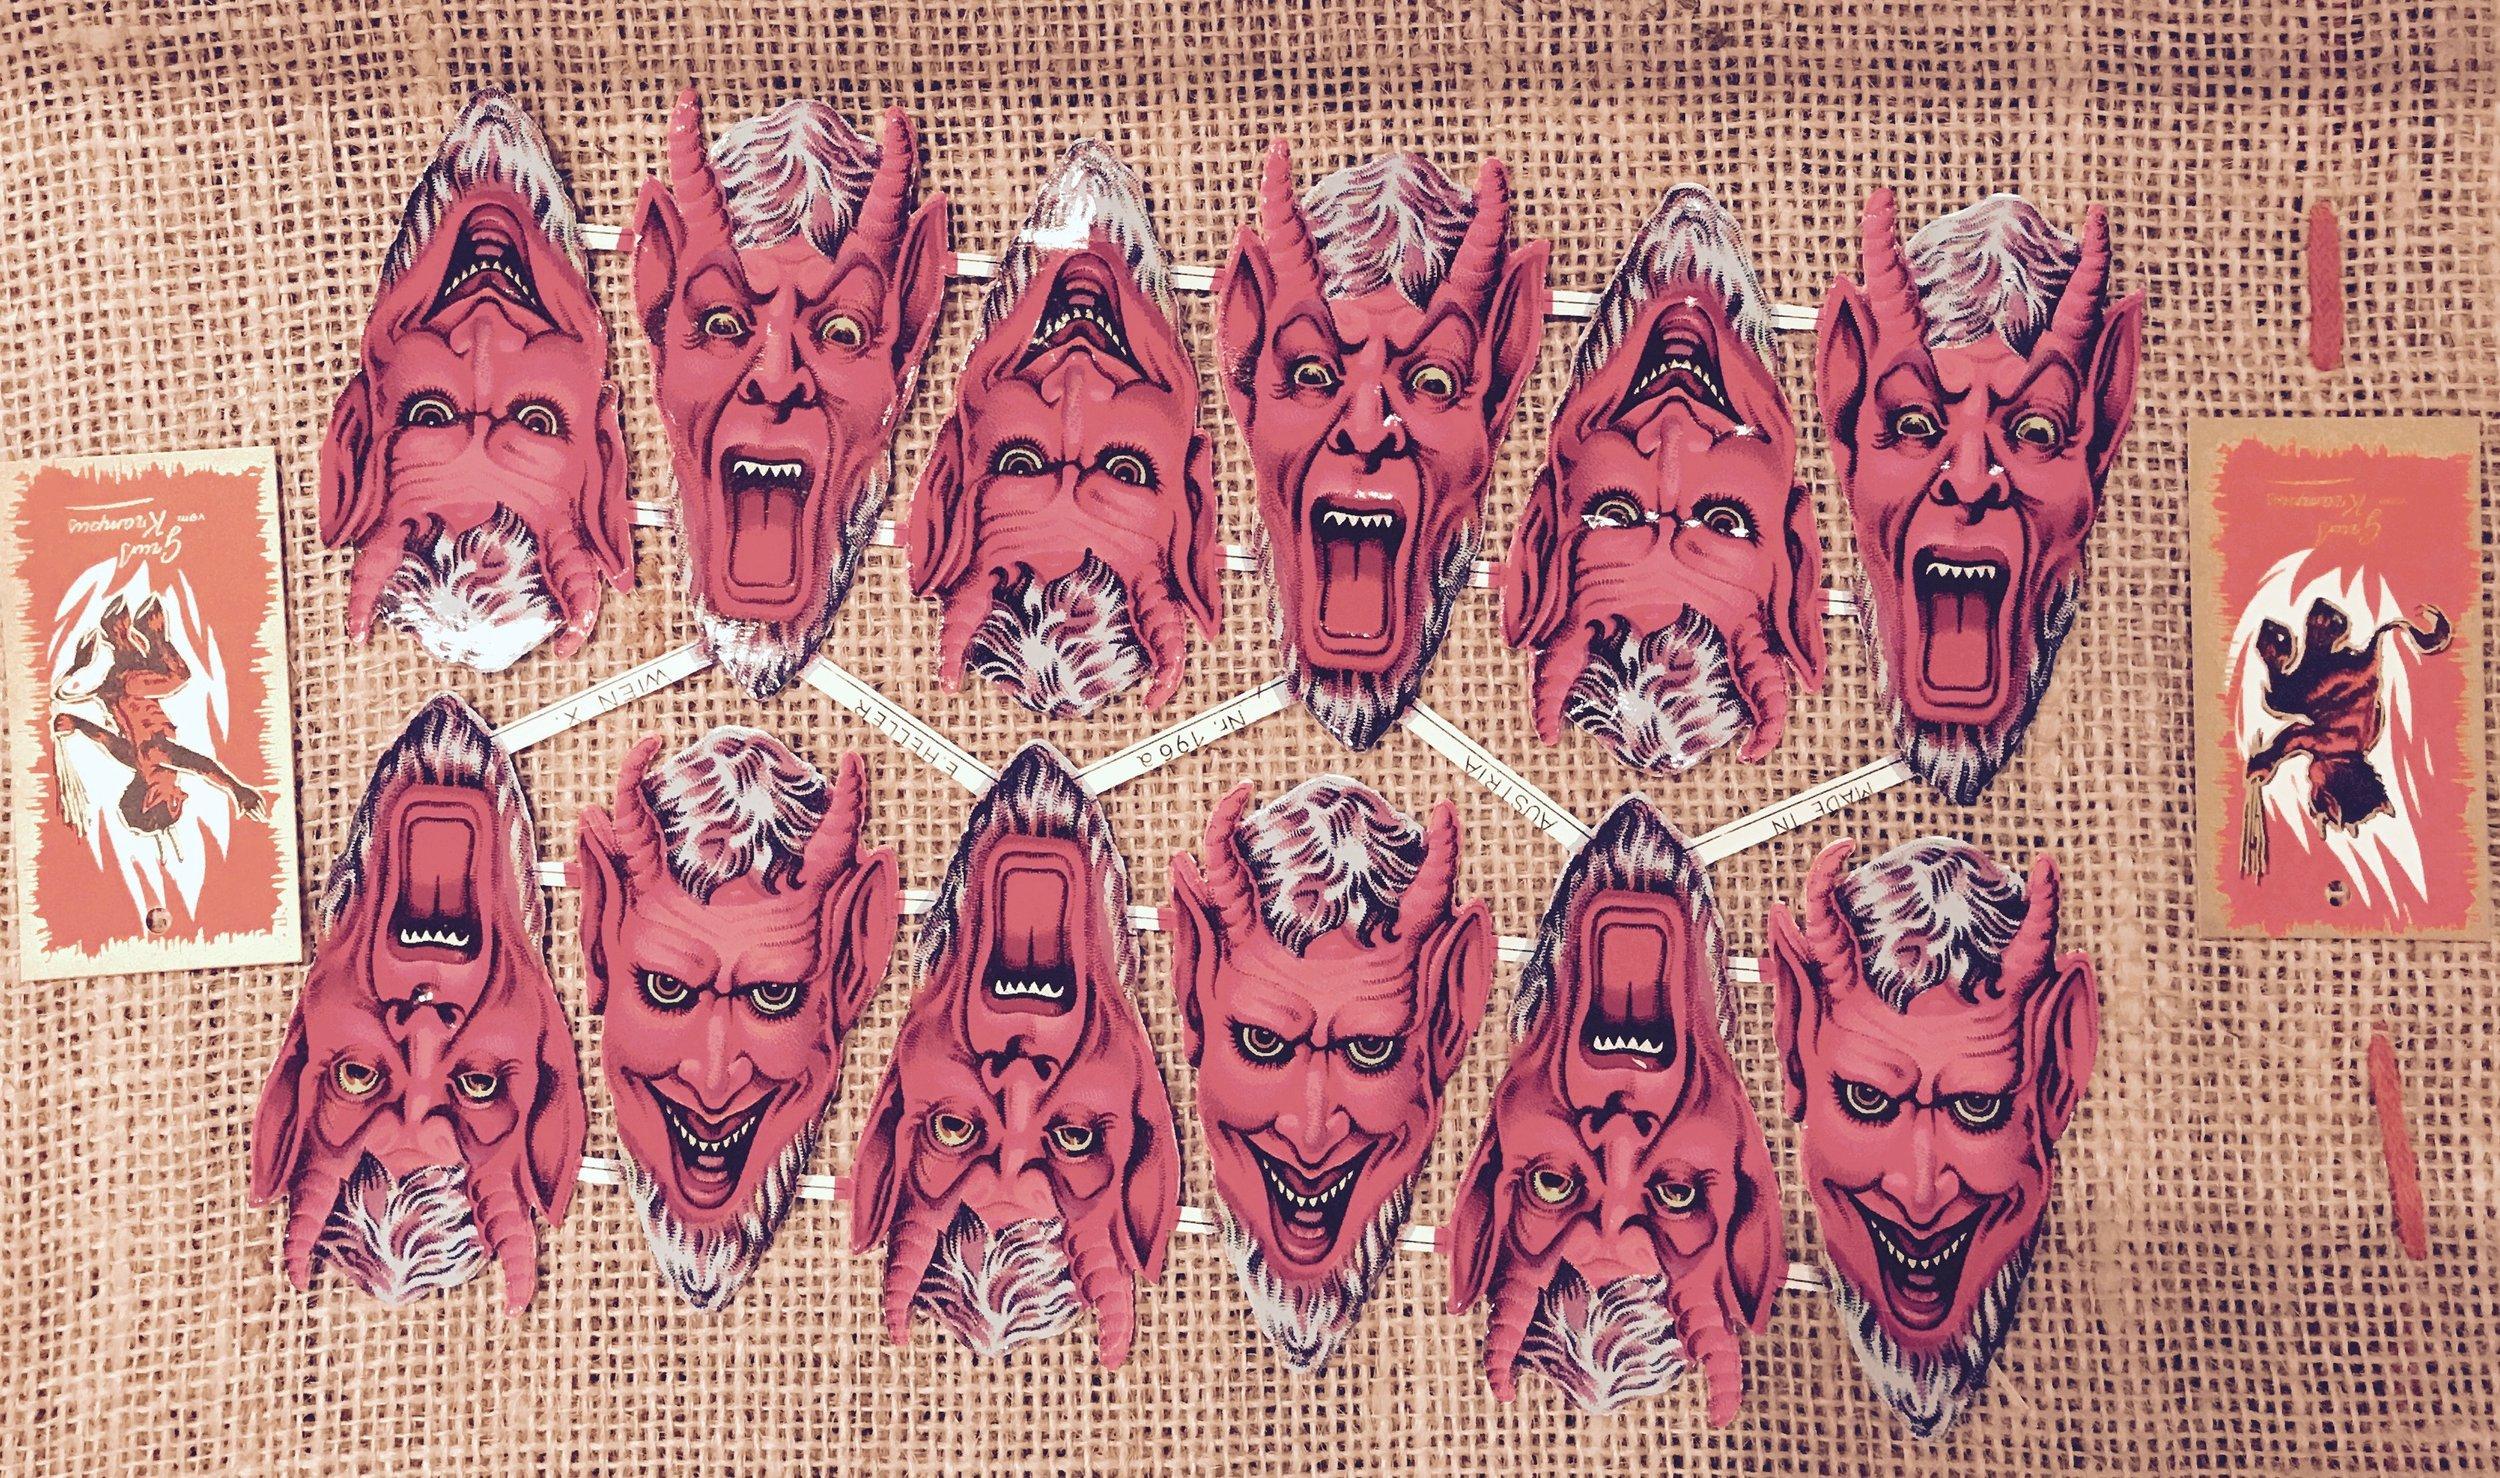 paper-cut krampus masks